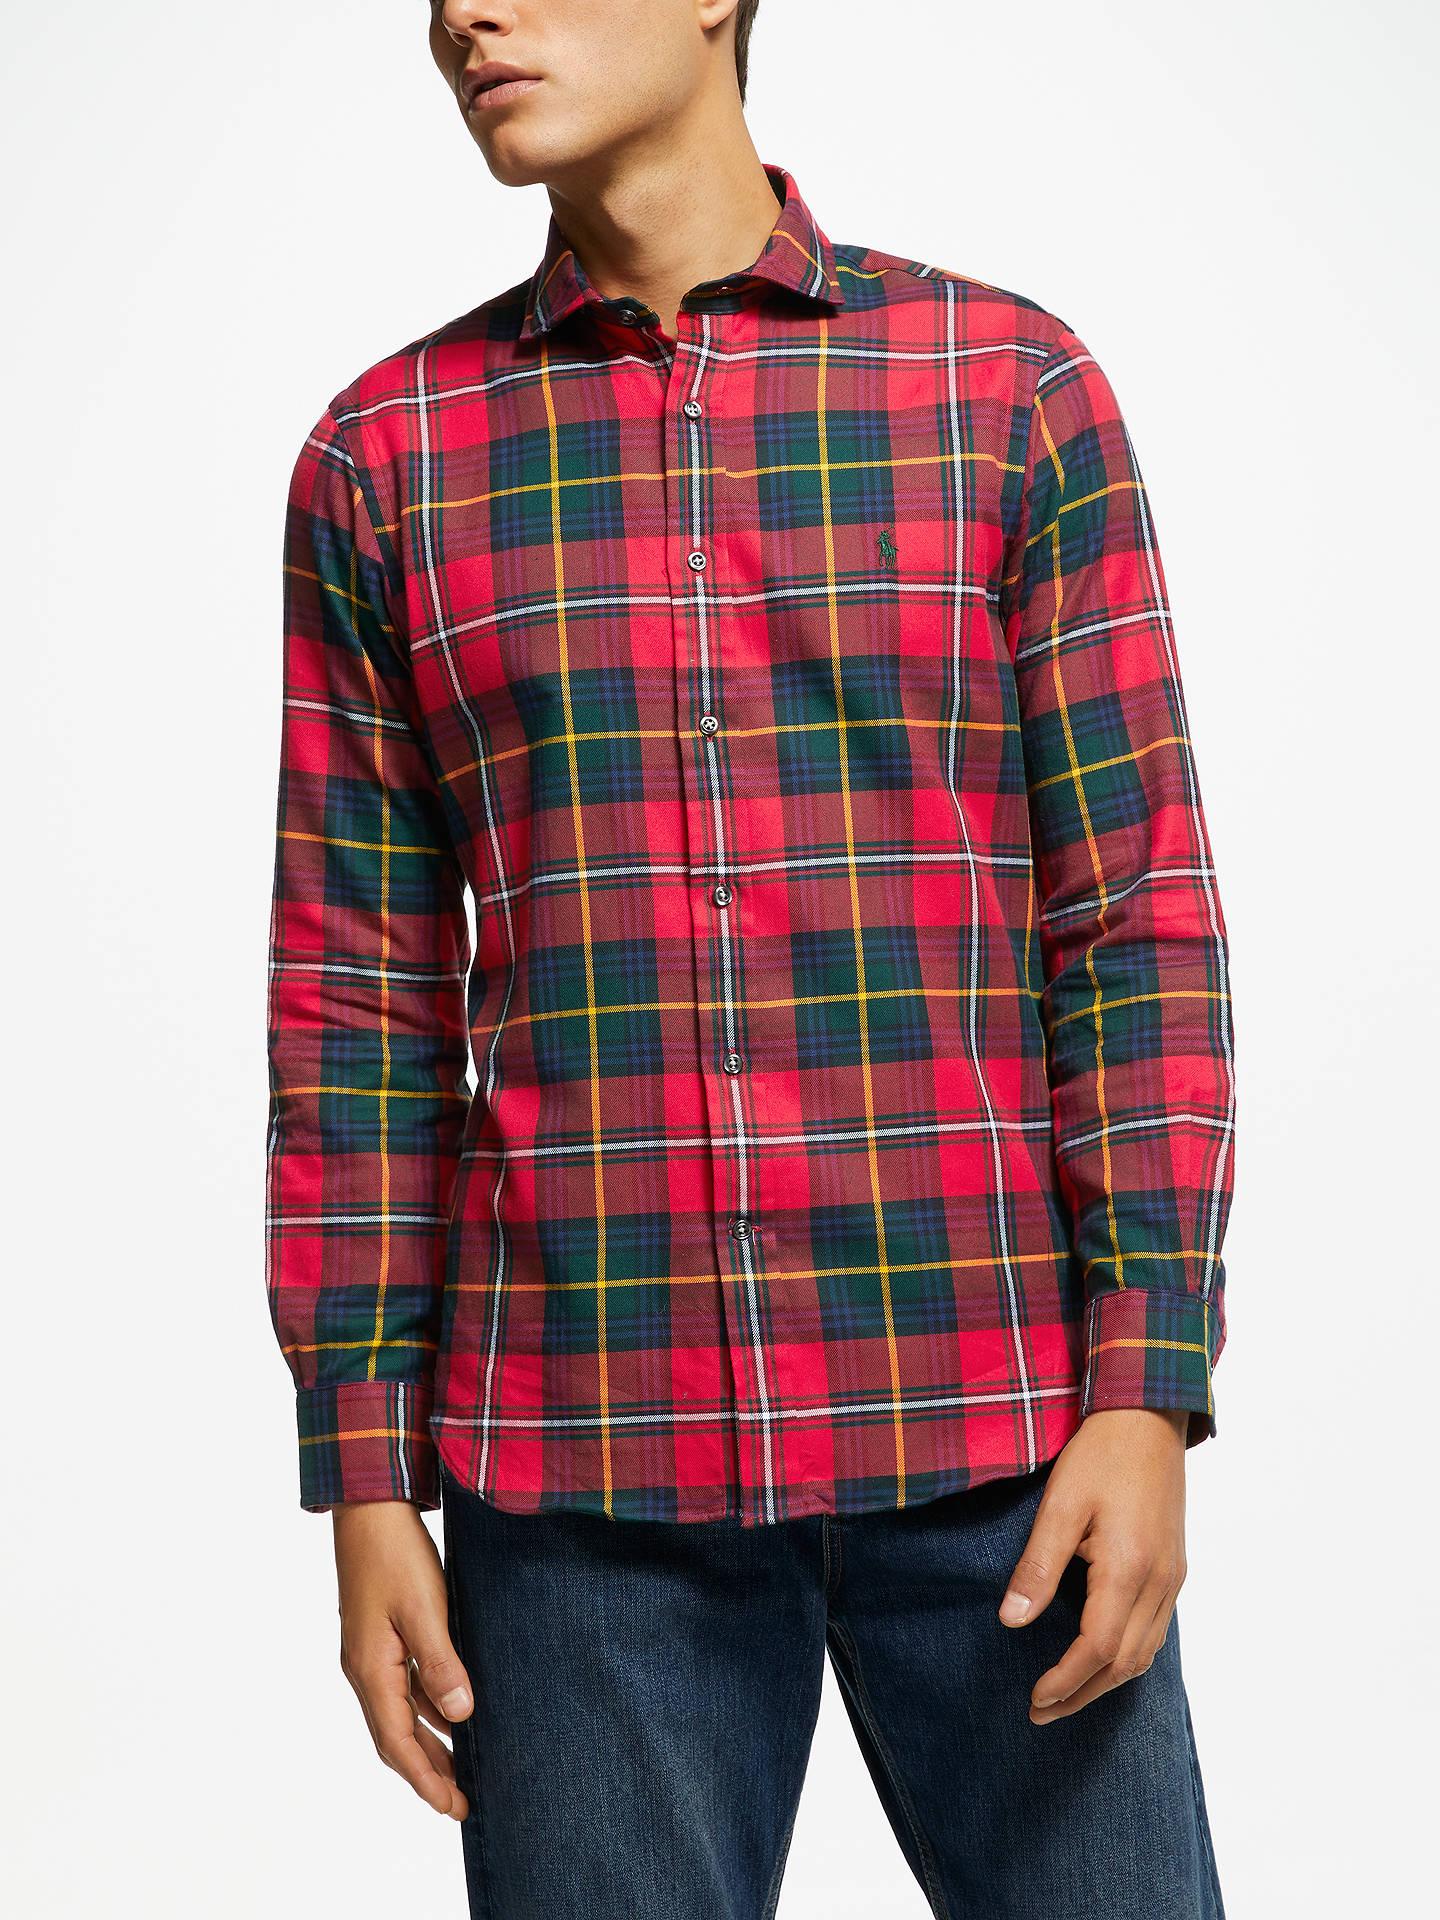 Polo Ralph Lauren Long Sleeve Slim Fit Check Shirt at John Lewis ... 5189458ba7f0e